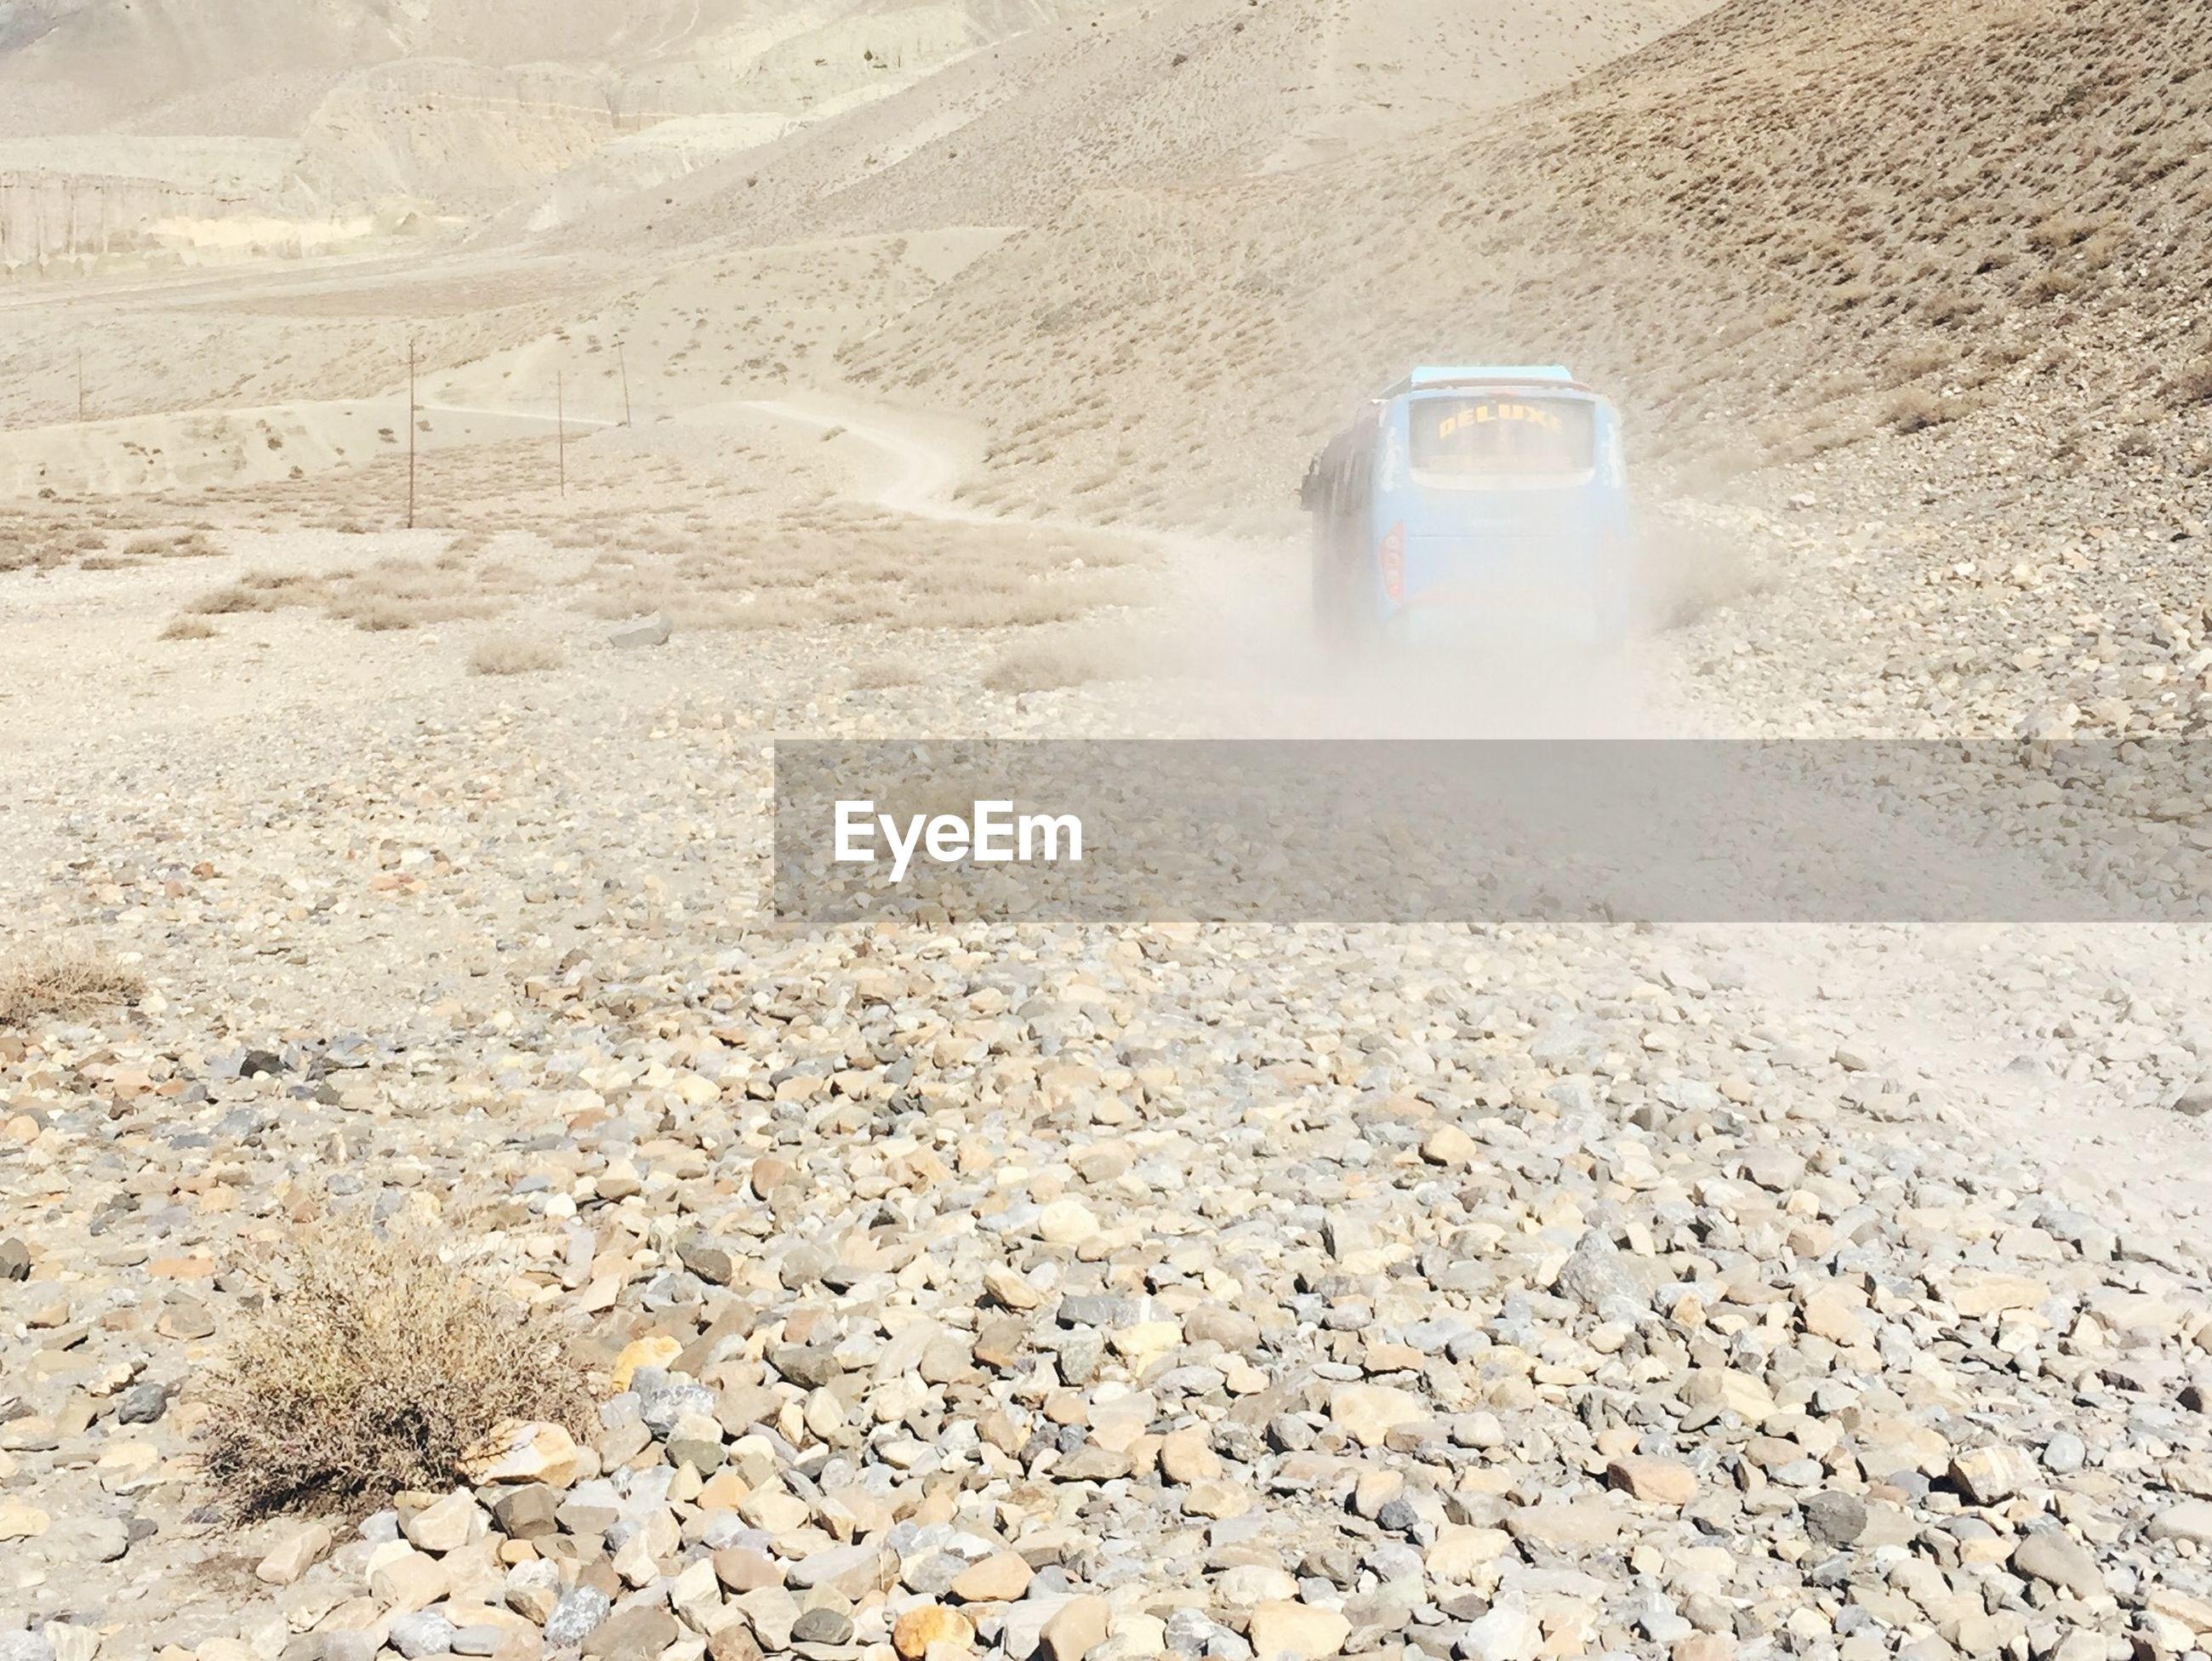 Bus on dirt road at annapurna range